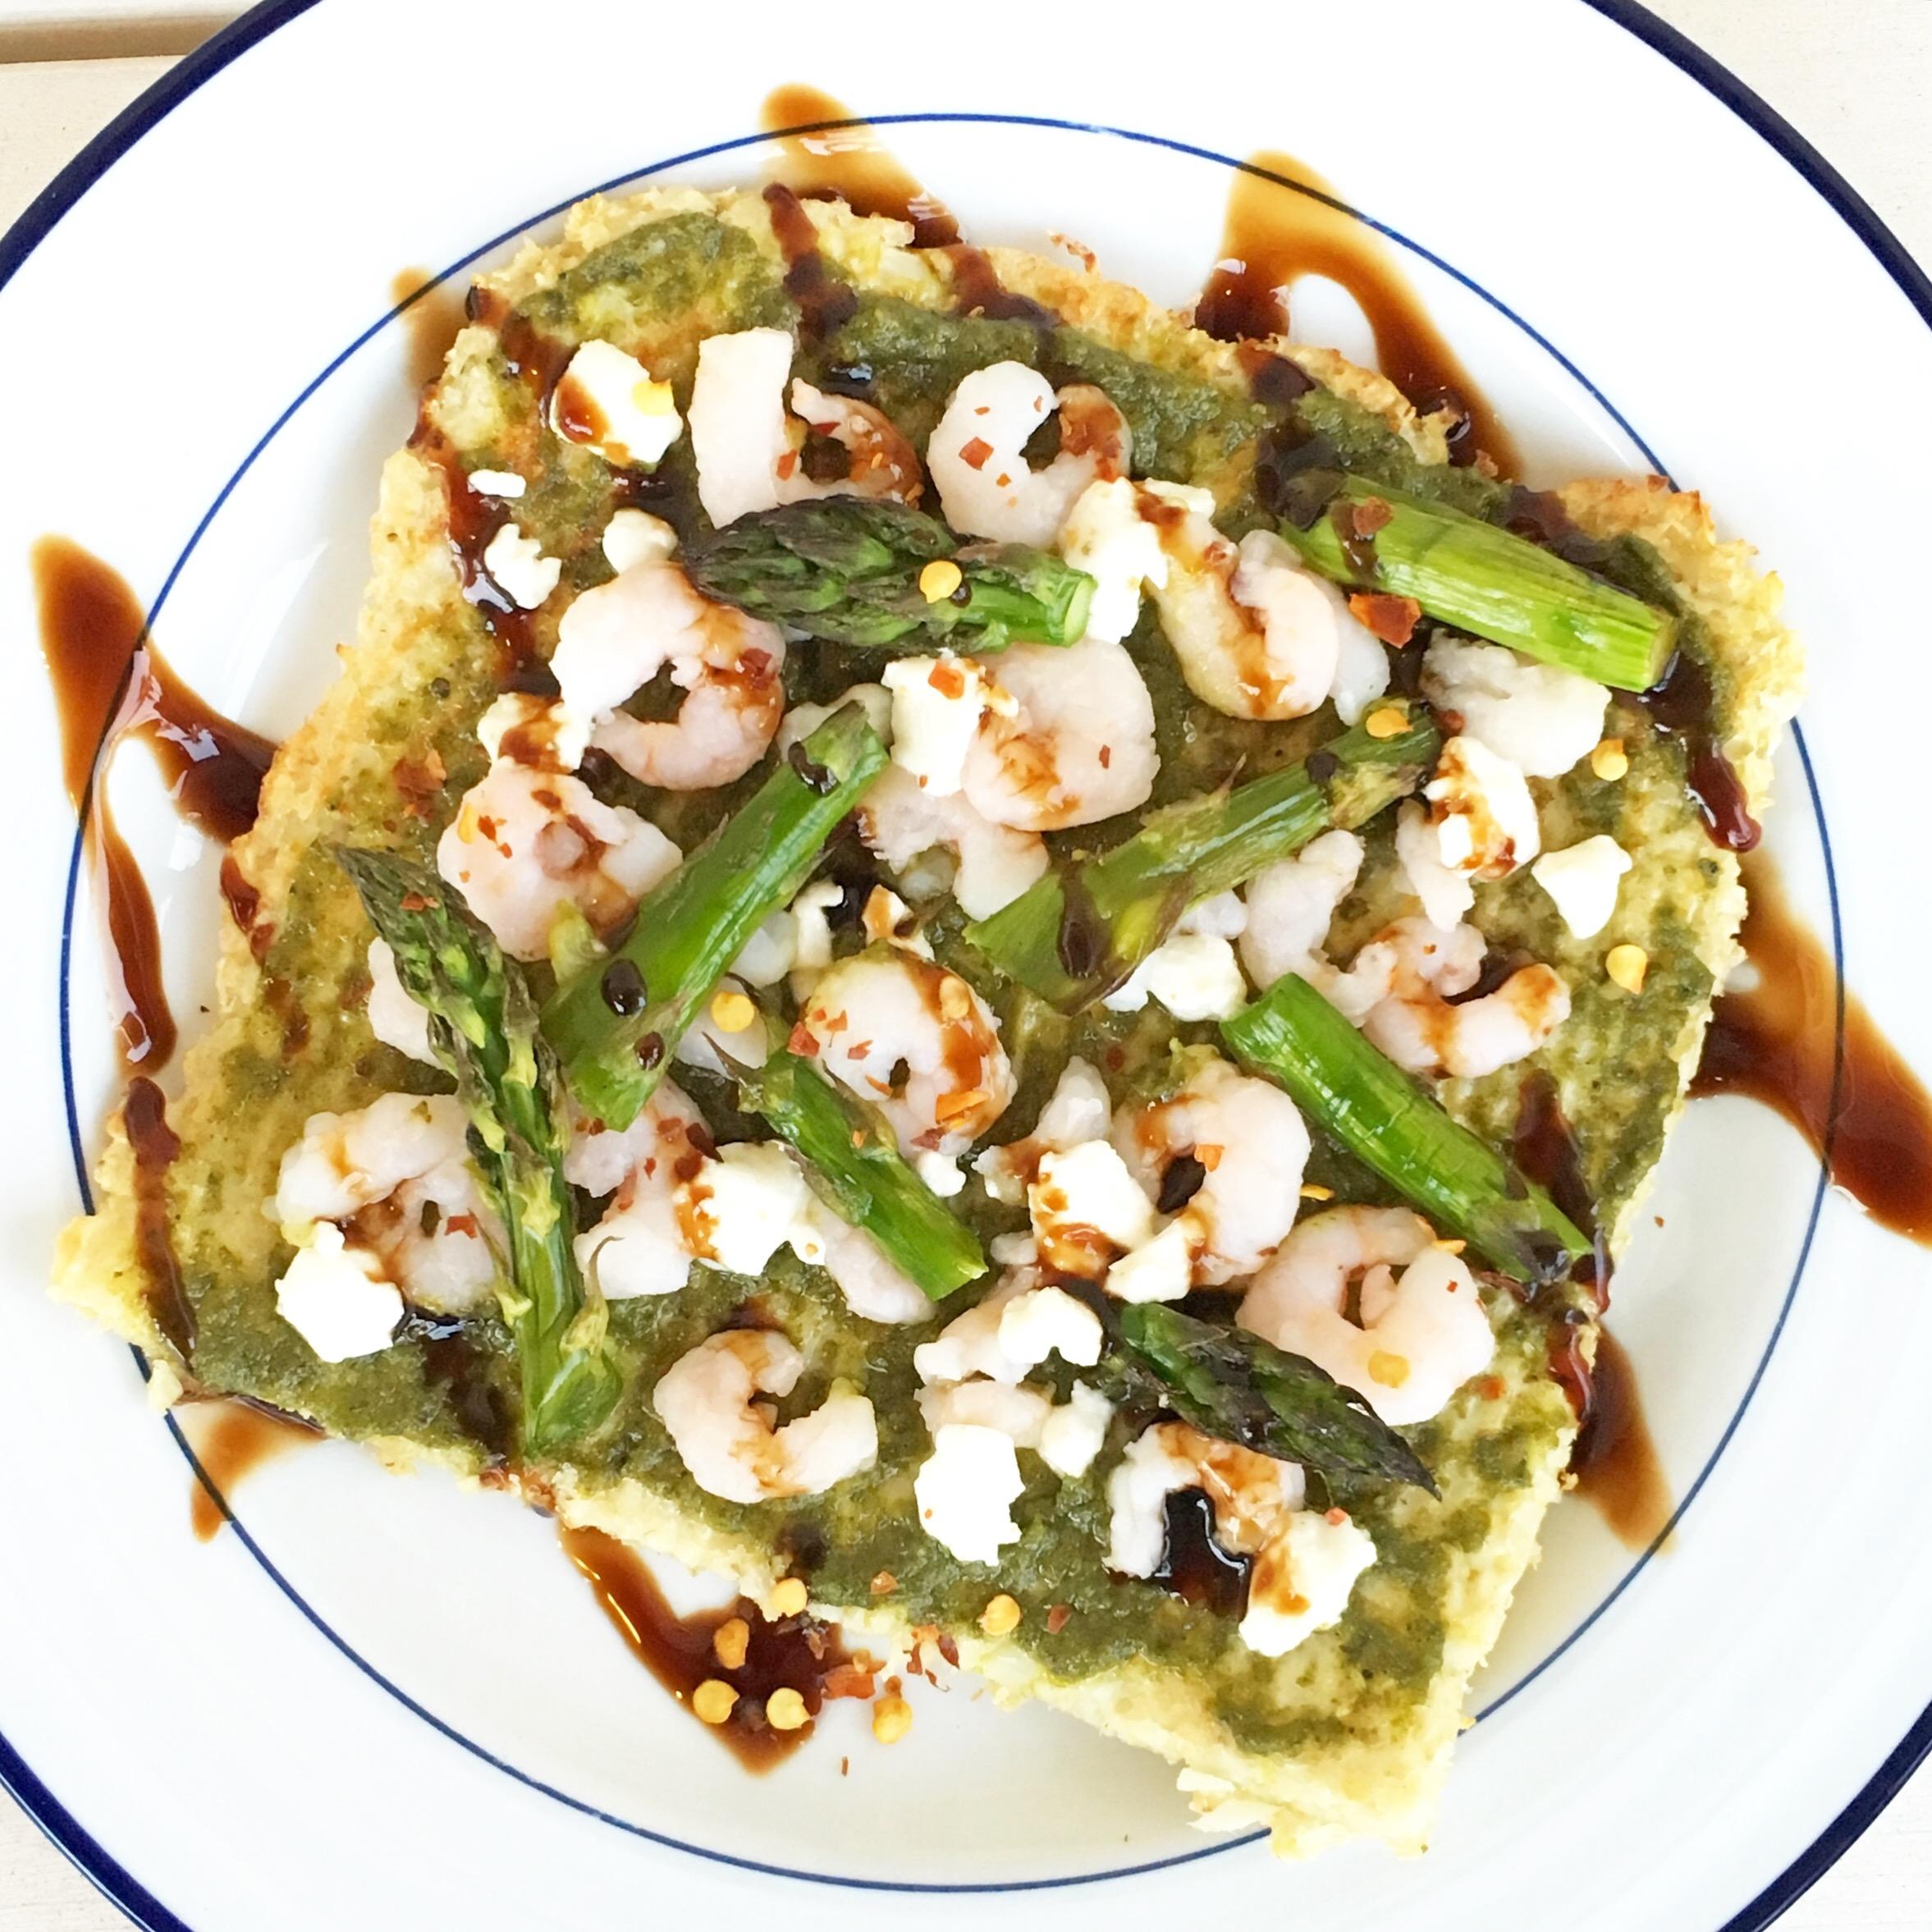 Walnut Pesto, Shrimp, and Asparagus Cauliflower Crust Flatbread